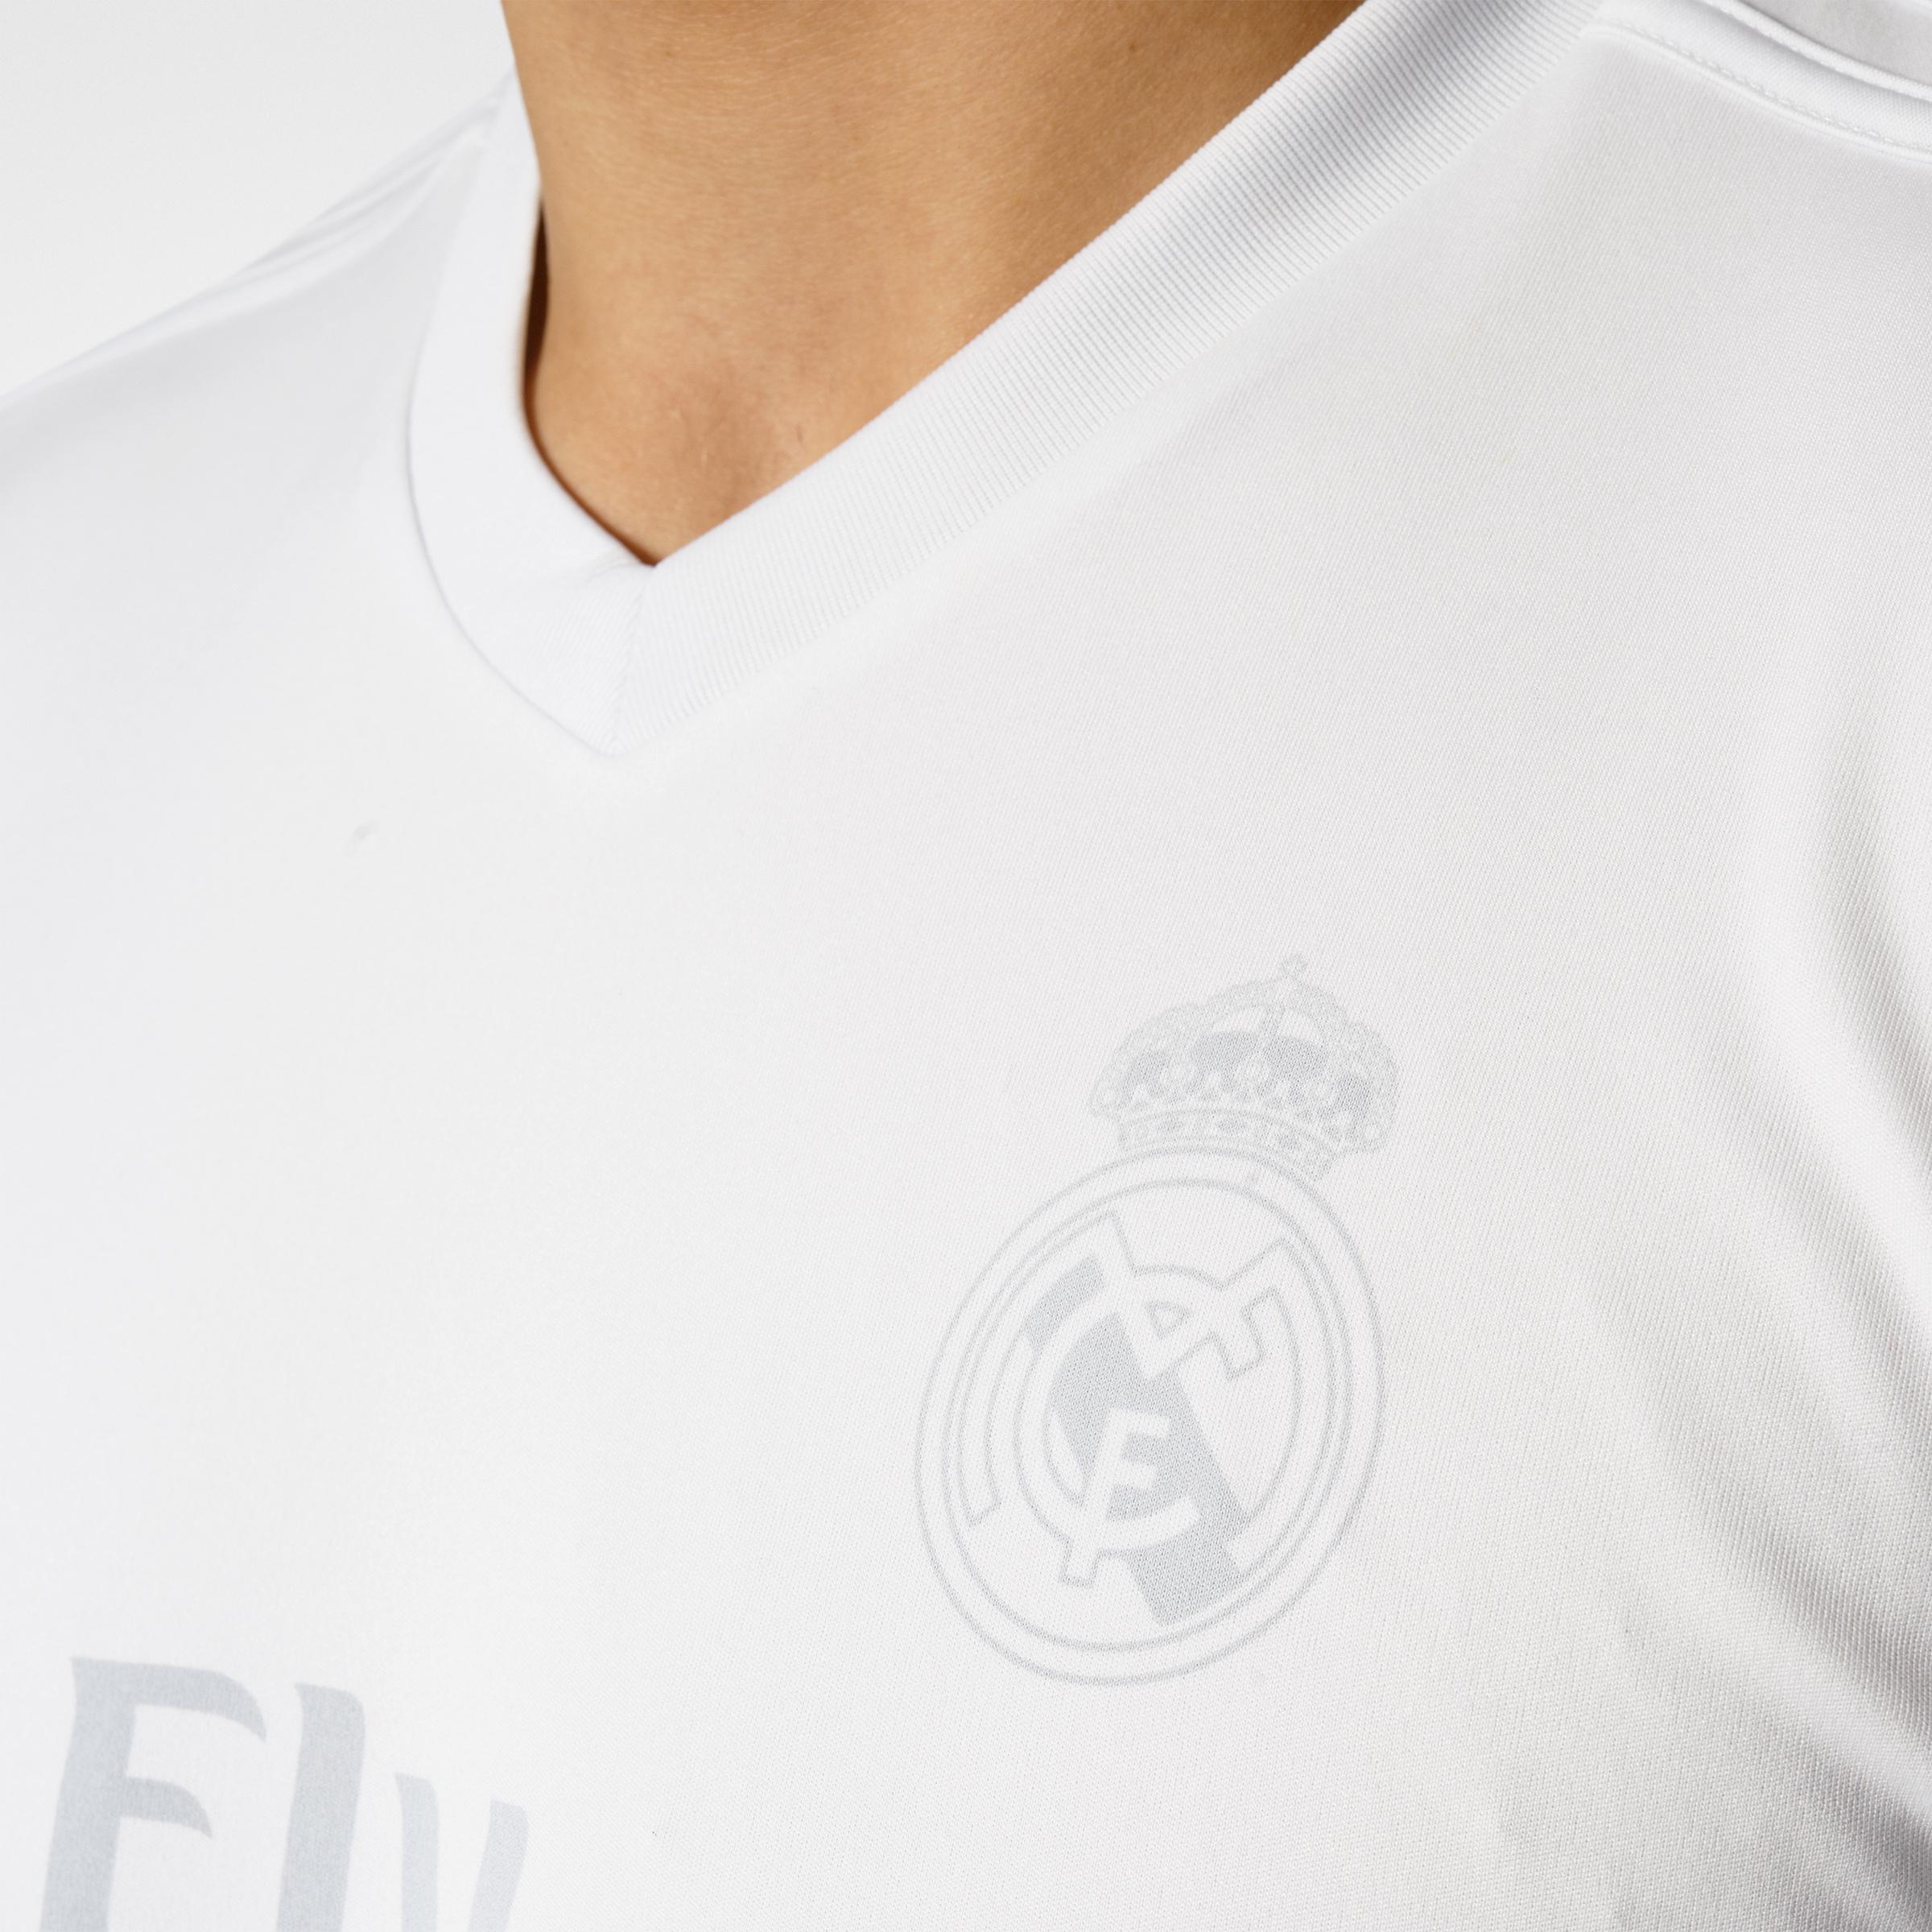 c79707e87 Adidas Real Madrid Parley Jersey at £32.48